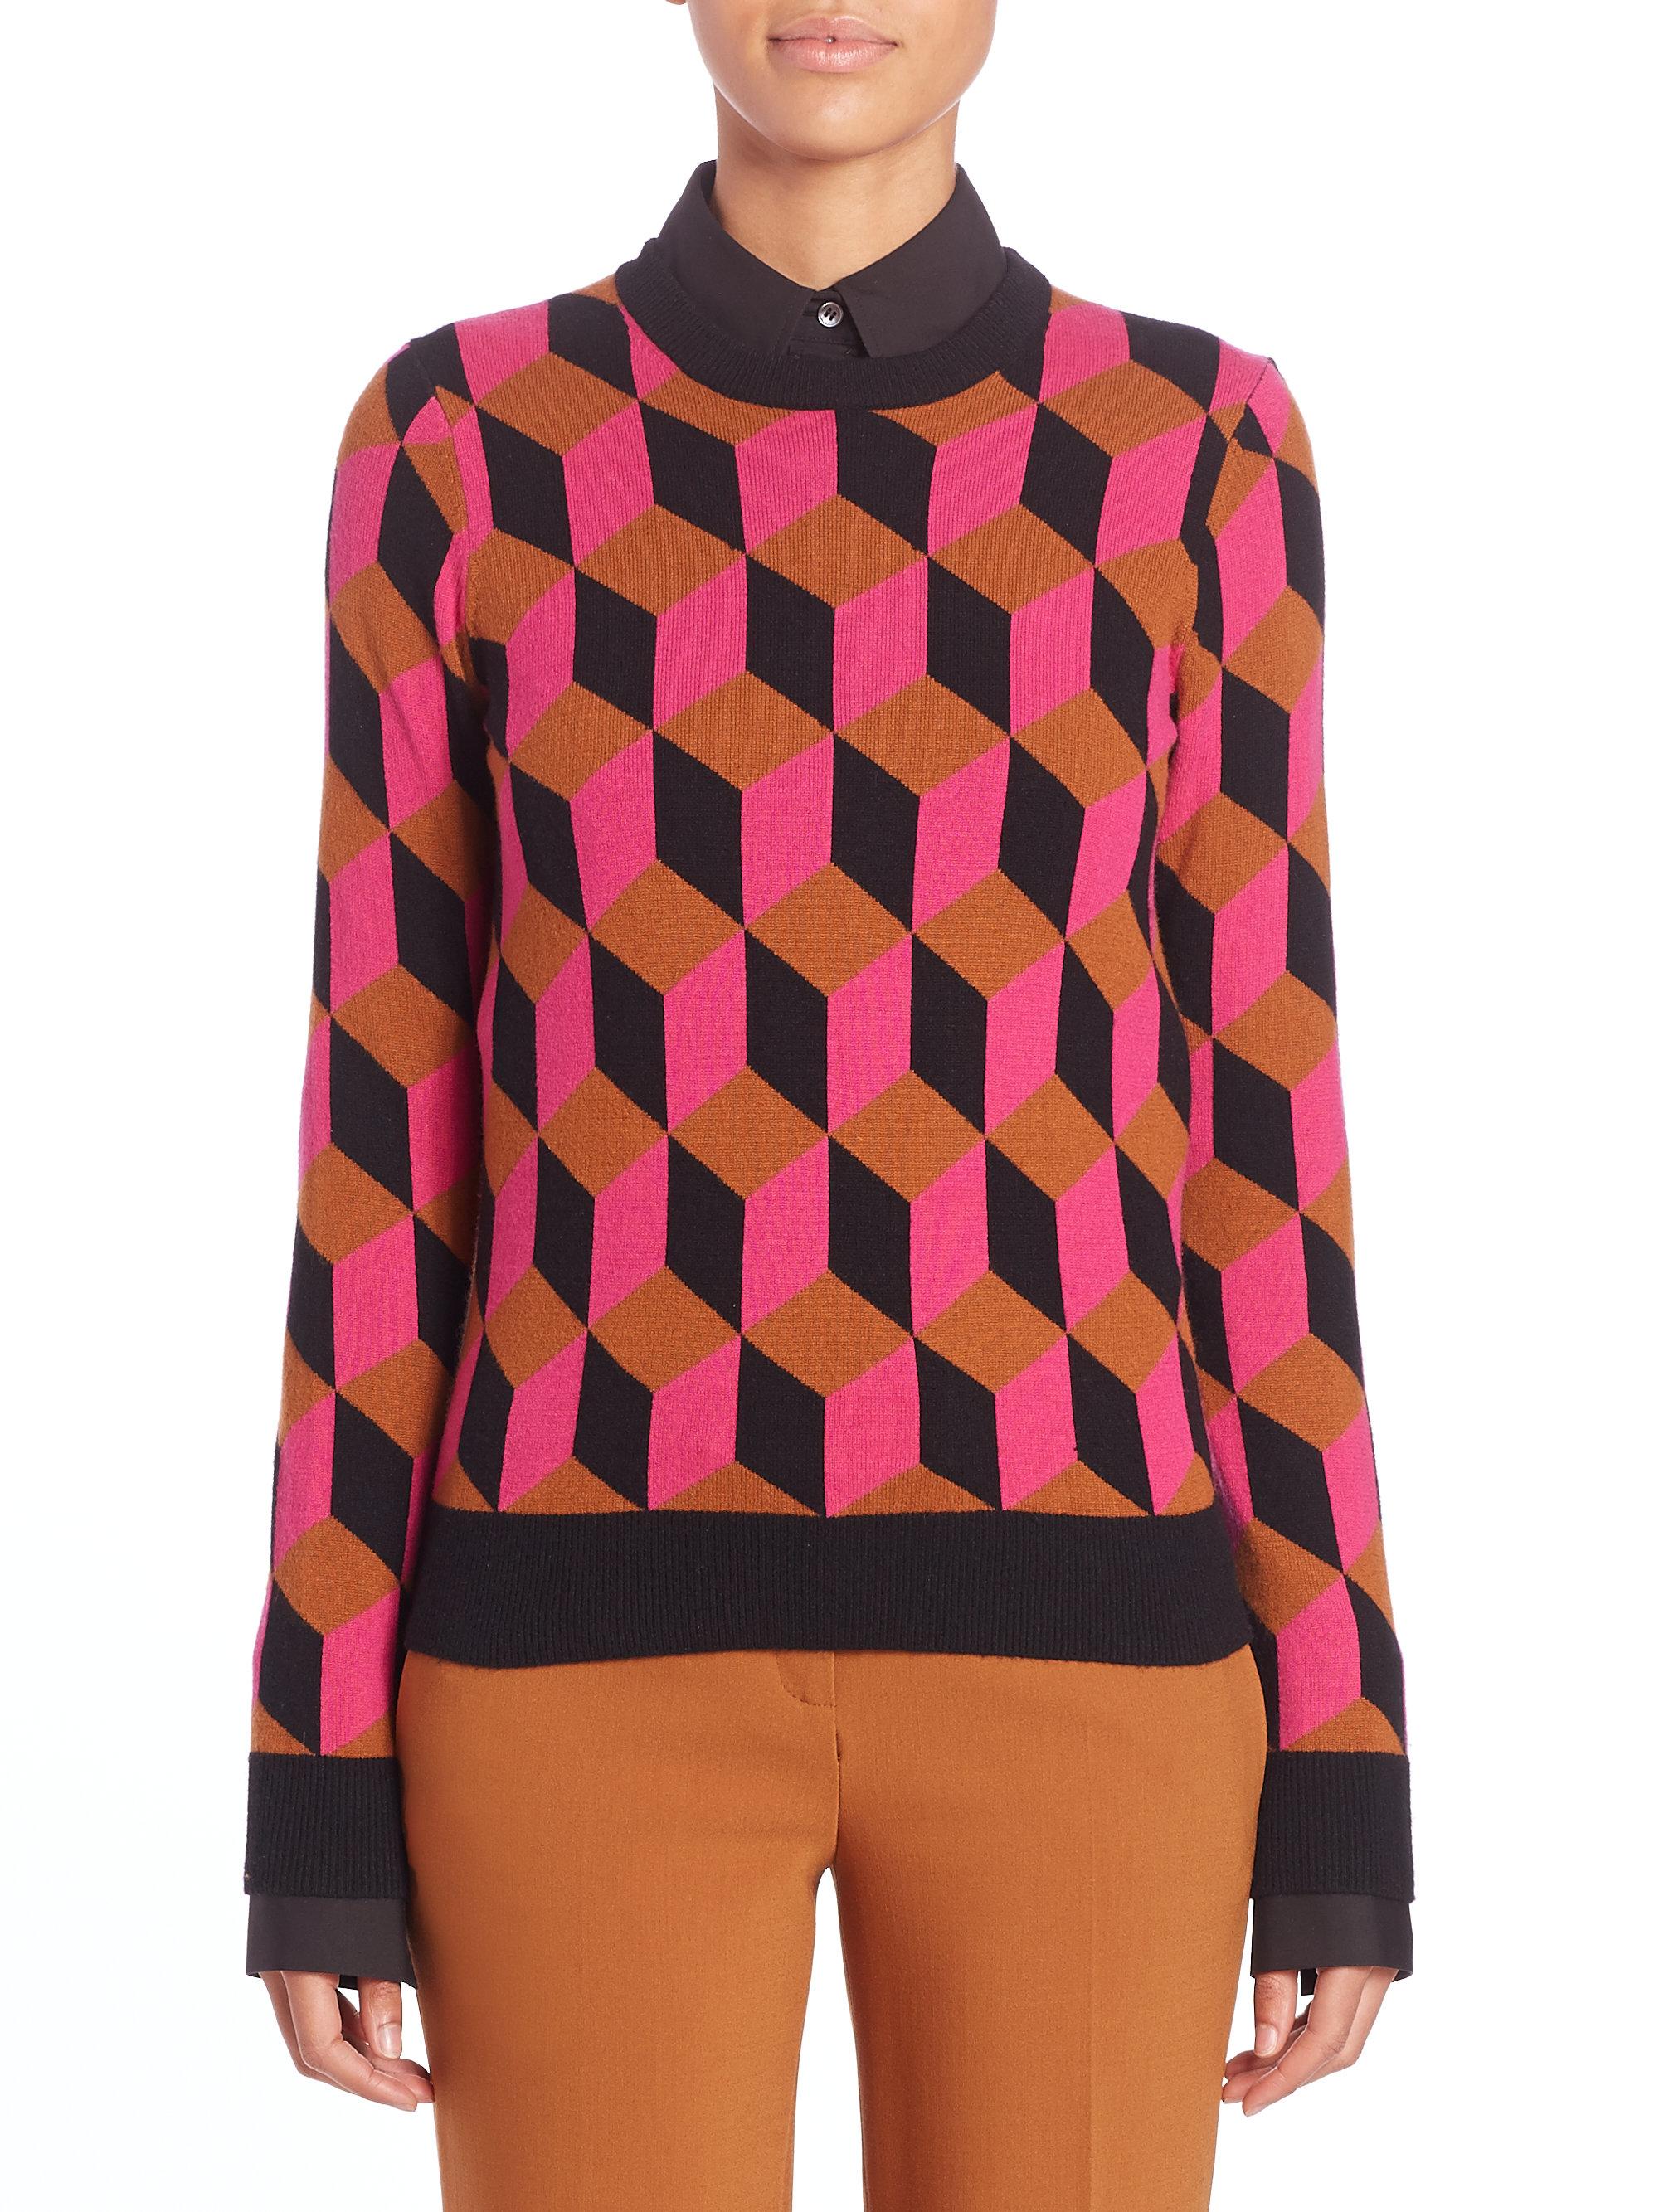 Michael kors Geometric Print Cashmere Sweater in Pink | Lyst